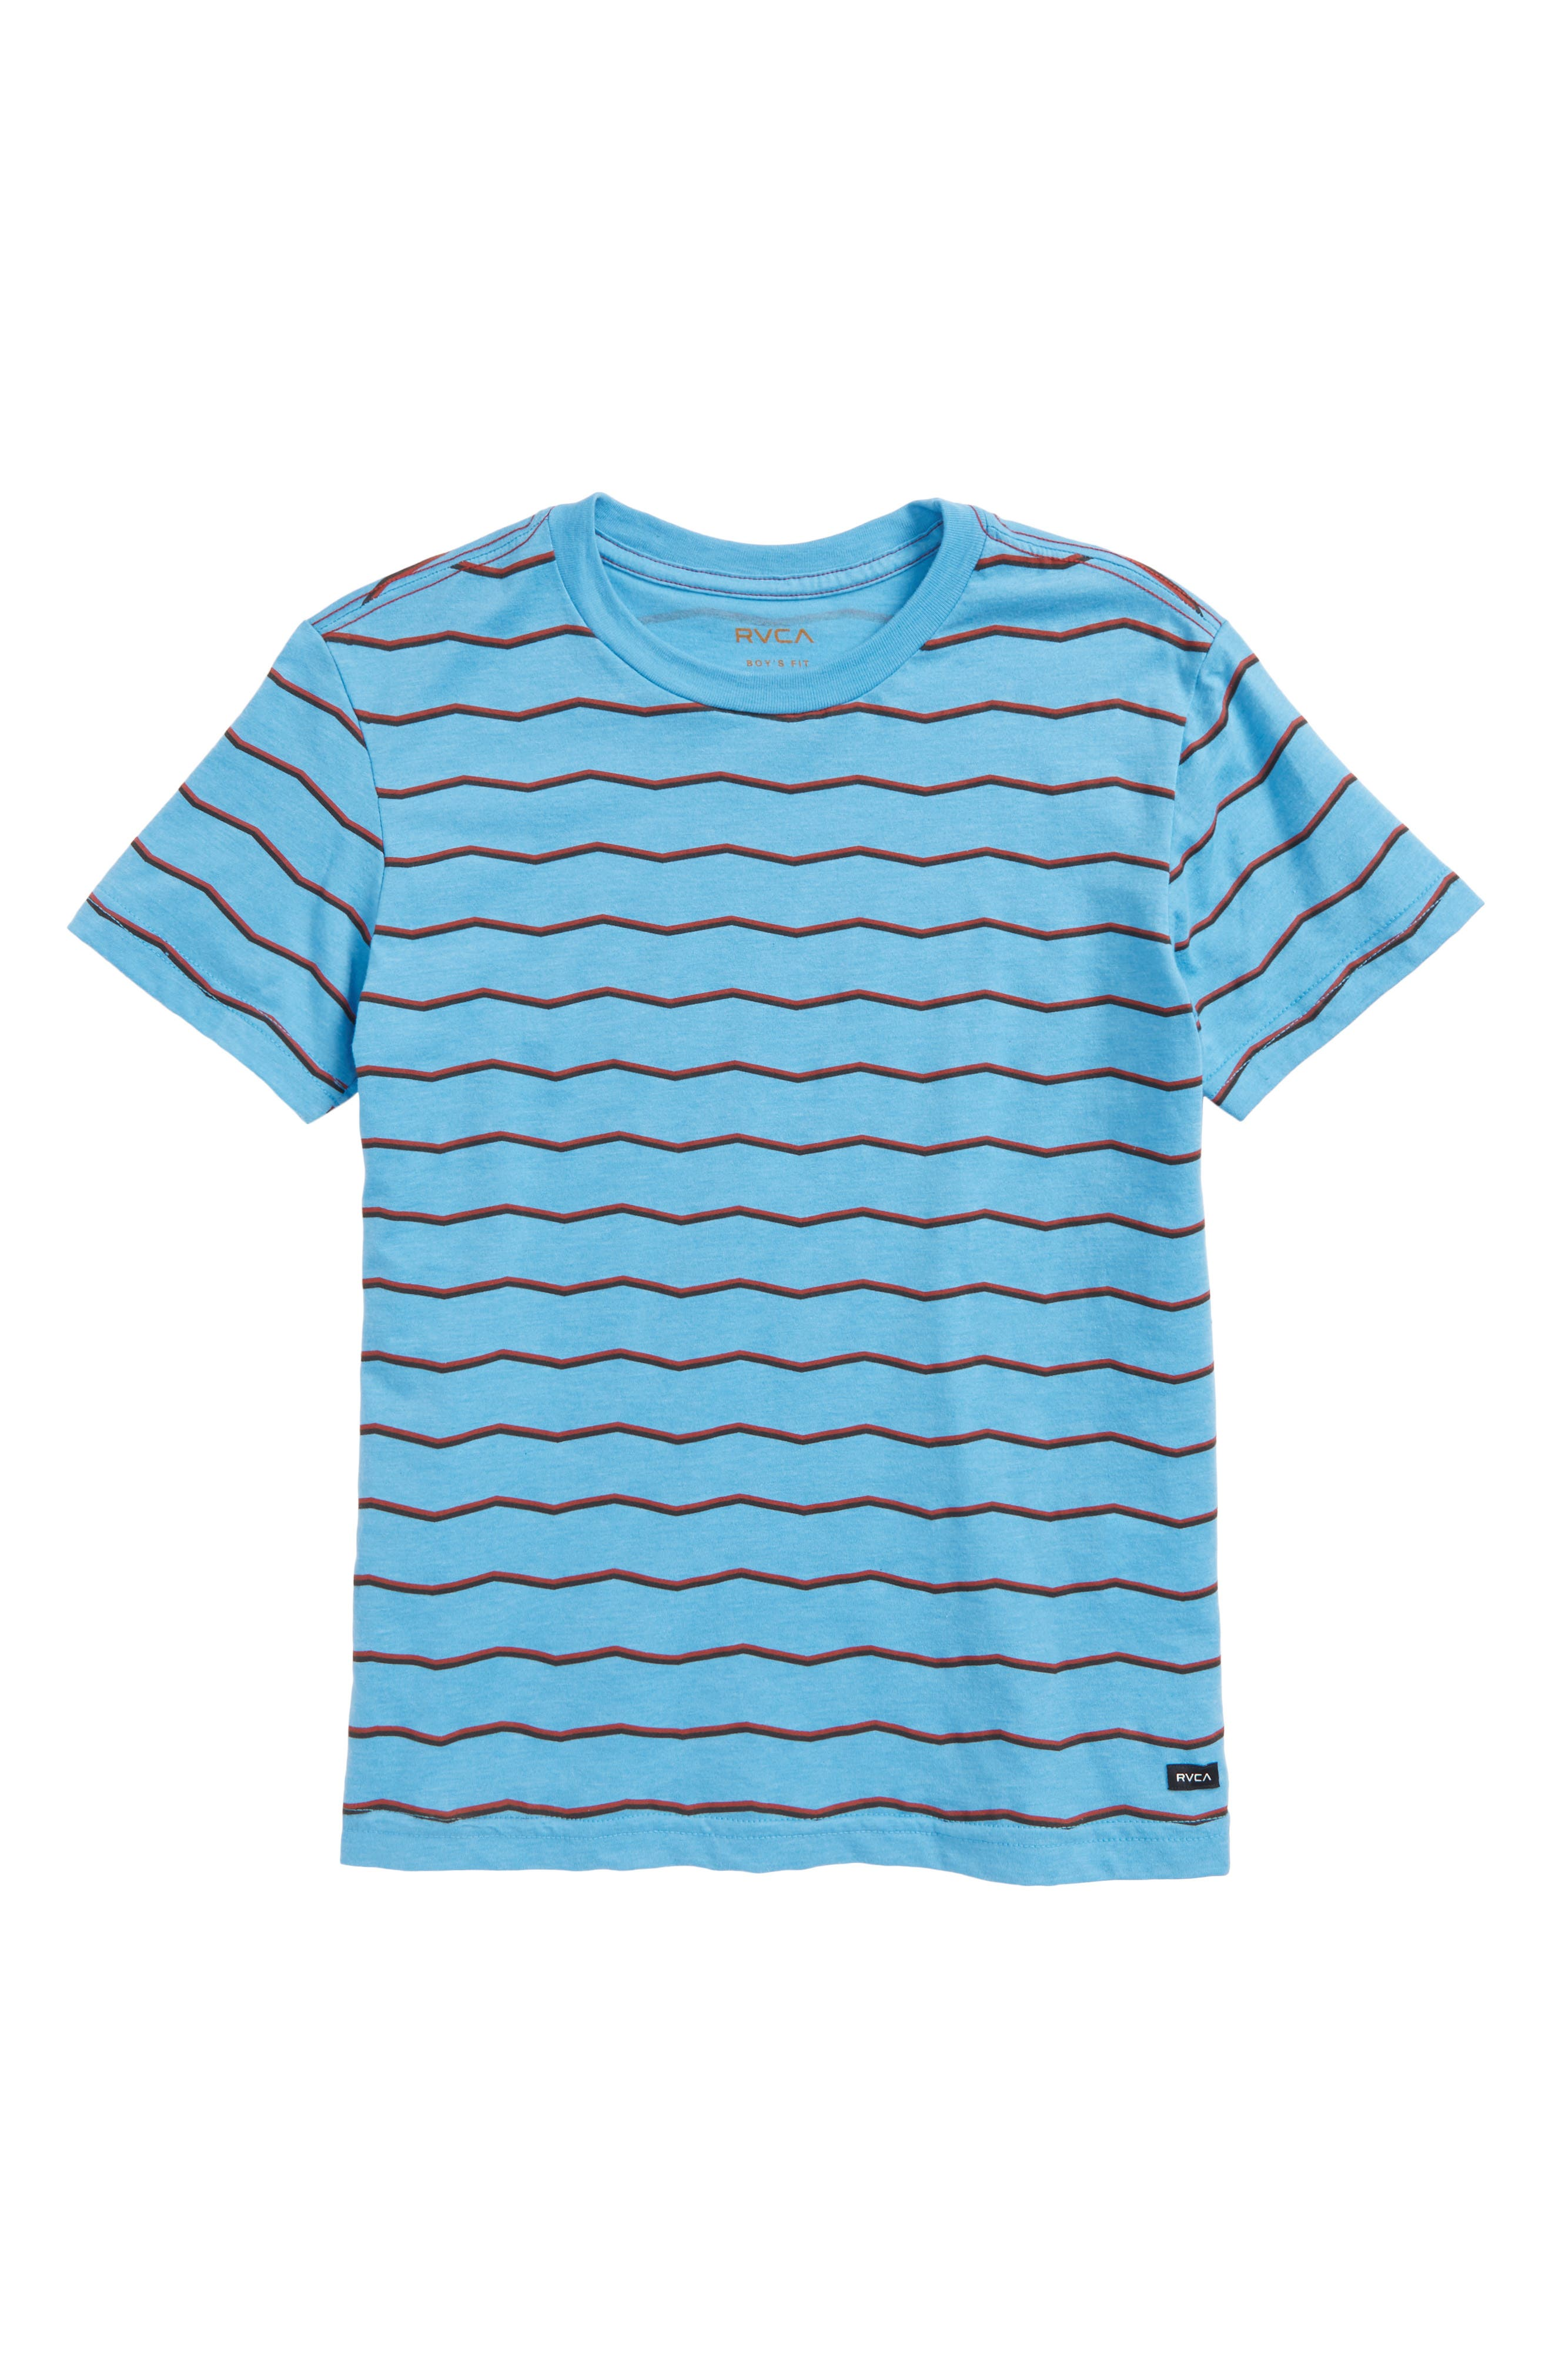 Stripe Shirt,                         Main,                         color, 460